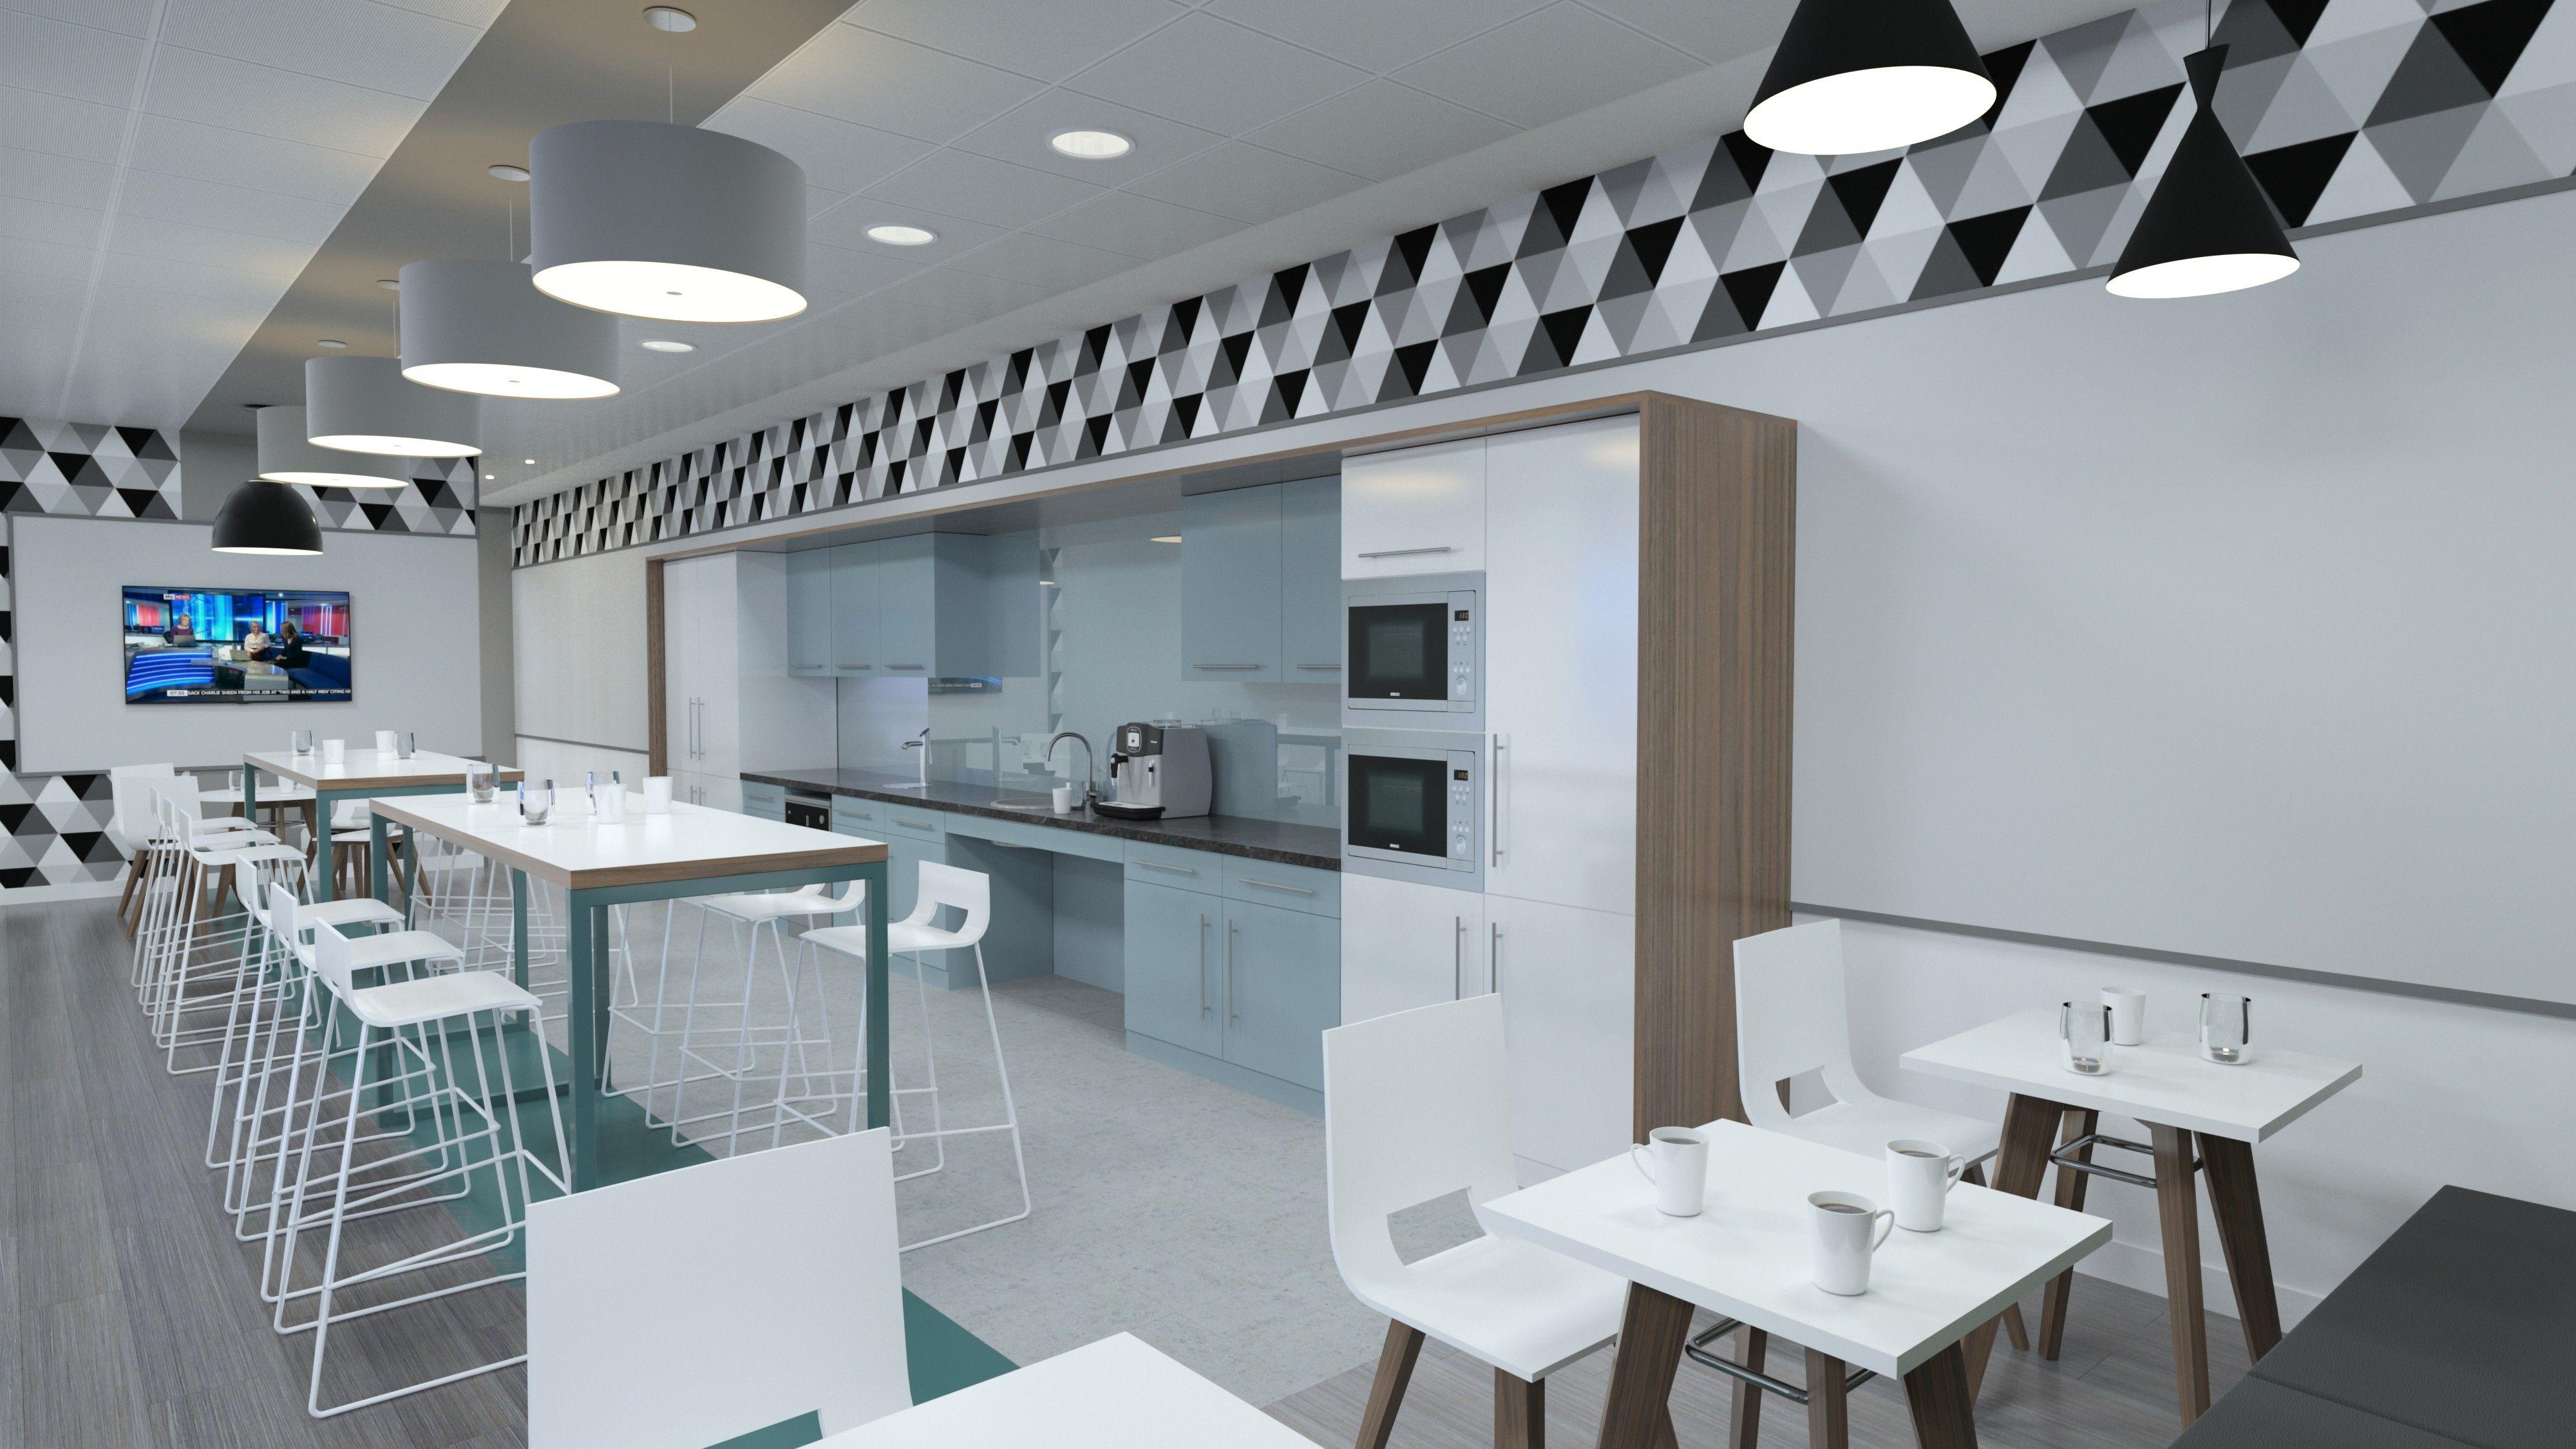 3D Studio Max Visual - Café / Teapoint / Breakout / Canteen ...